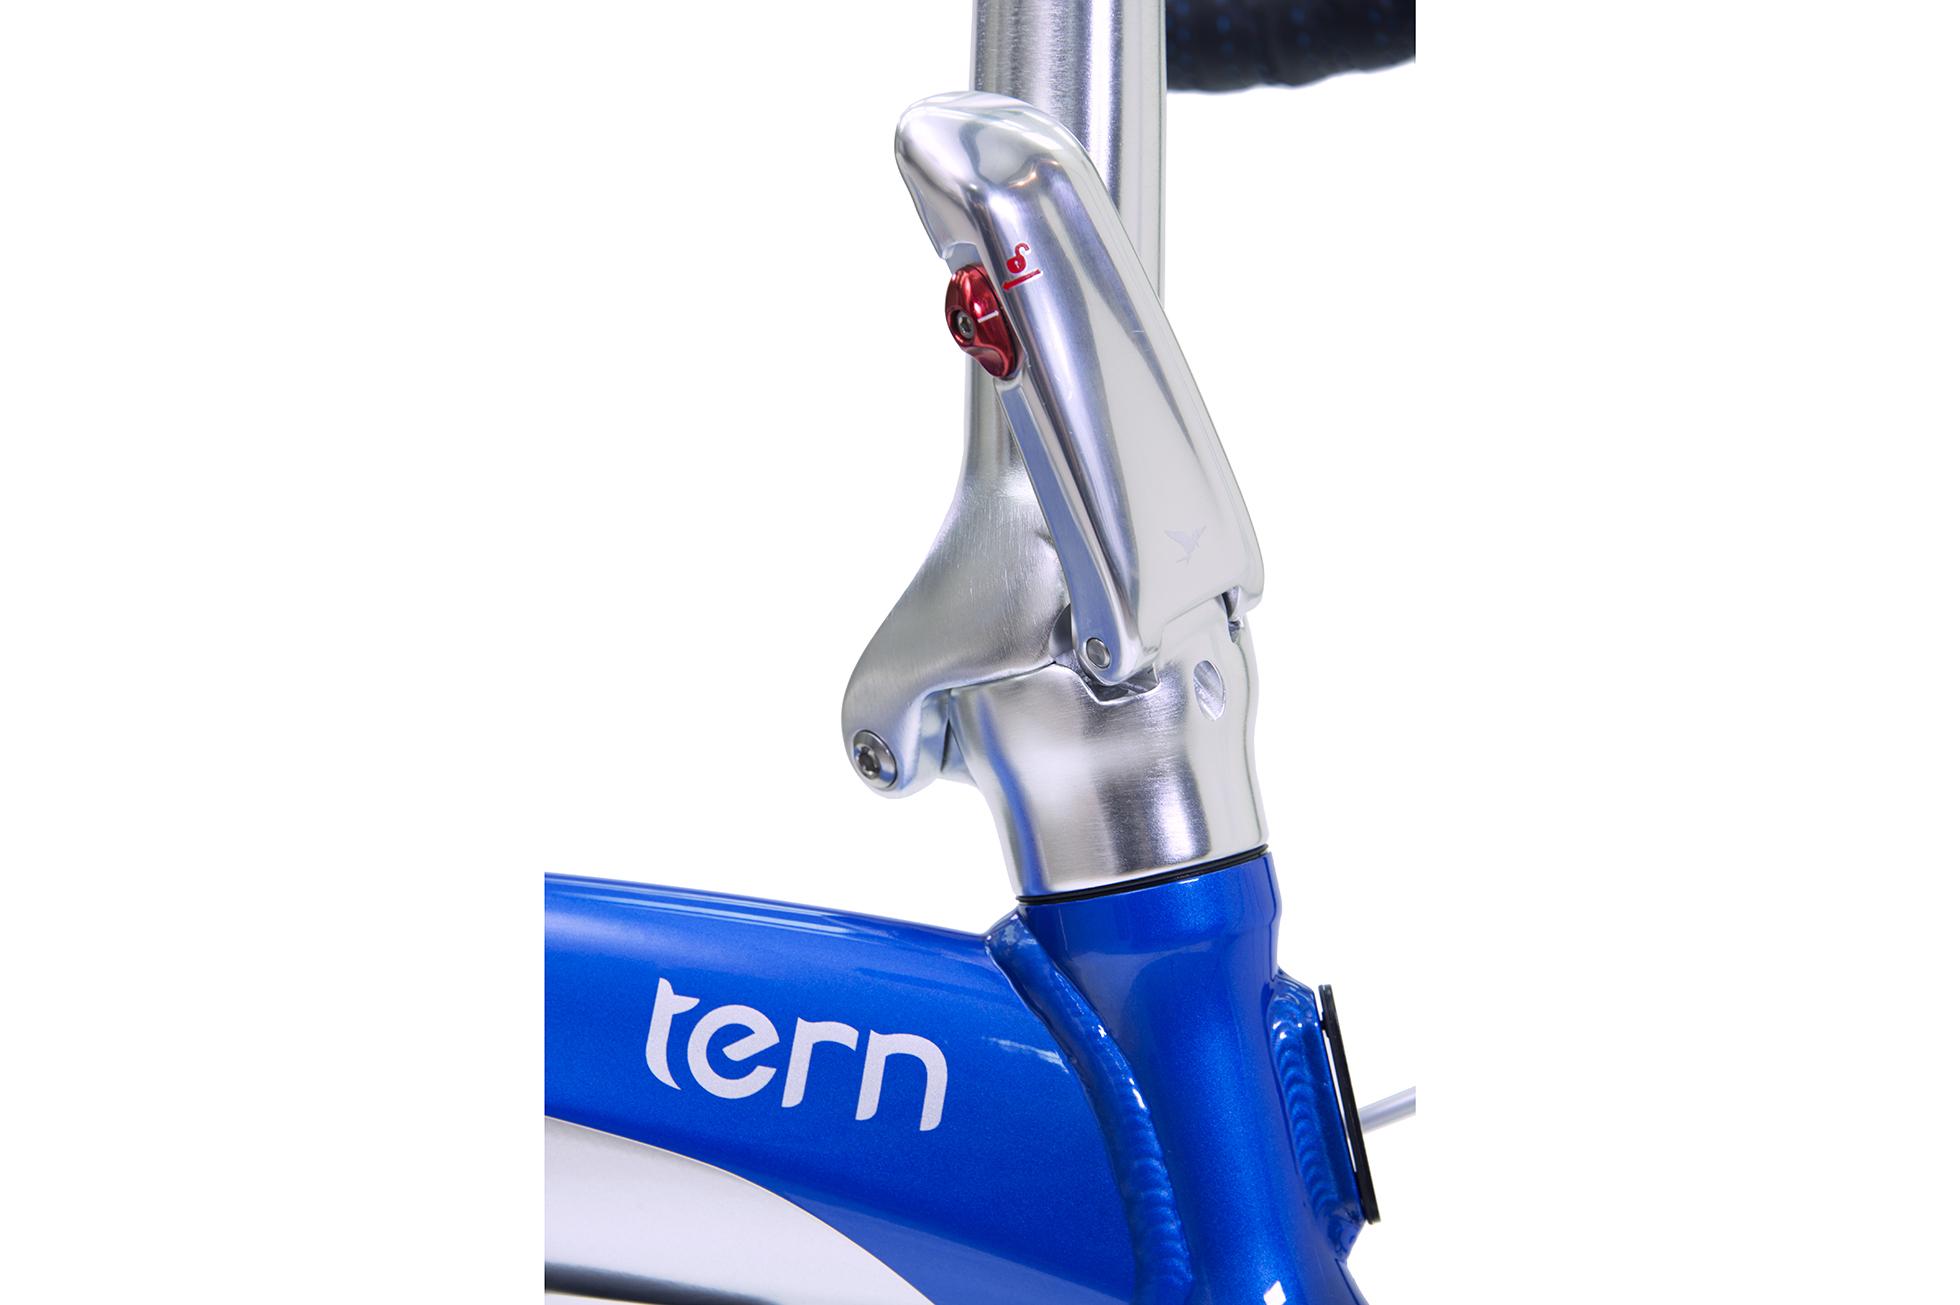 Verge X18 Tern Folding Bikes Worldwide